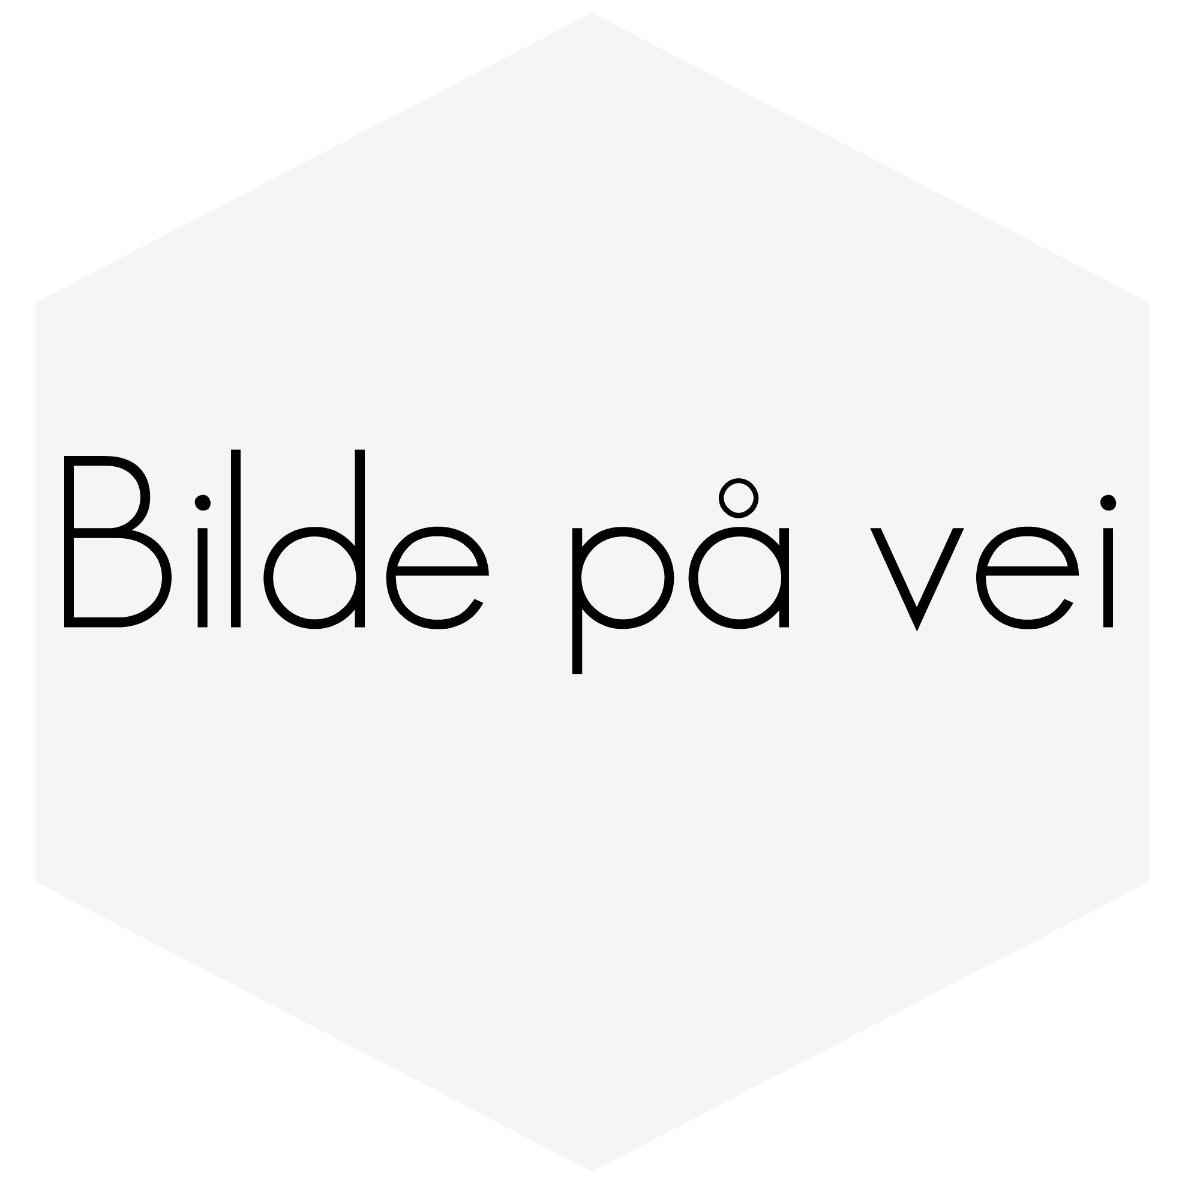 EXTRAKTORGRENRØR 740/ 940 STEG 1-2 B200/230 4SYL 8V